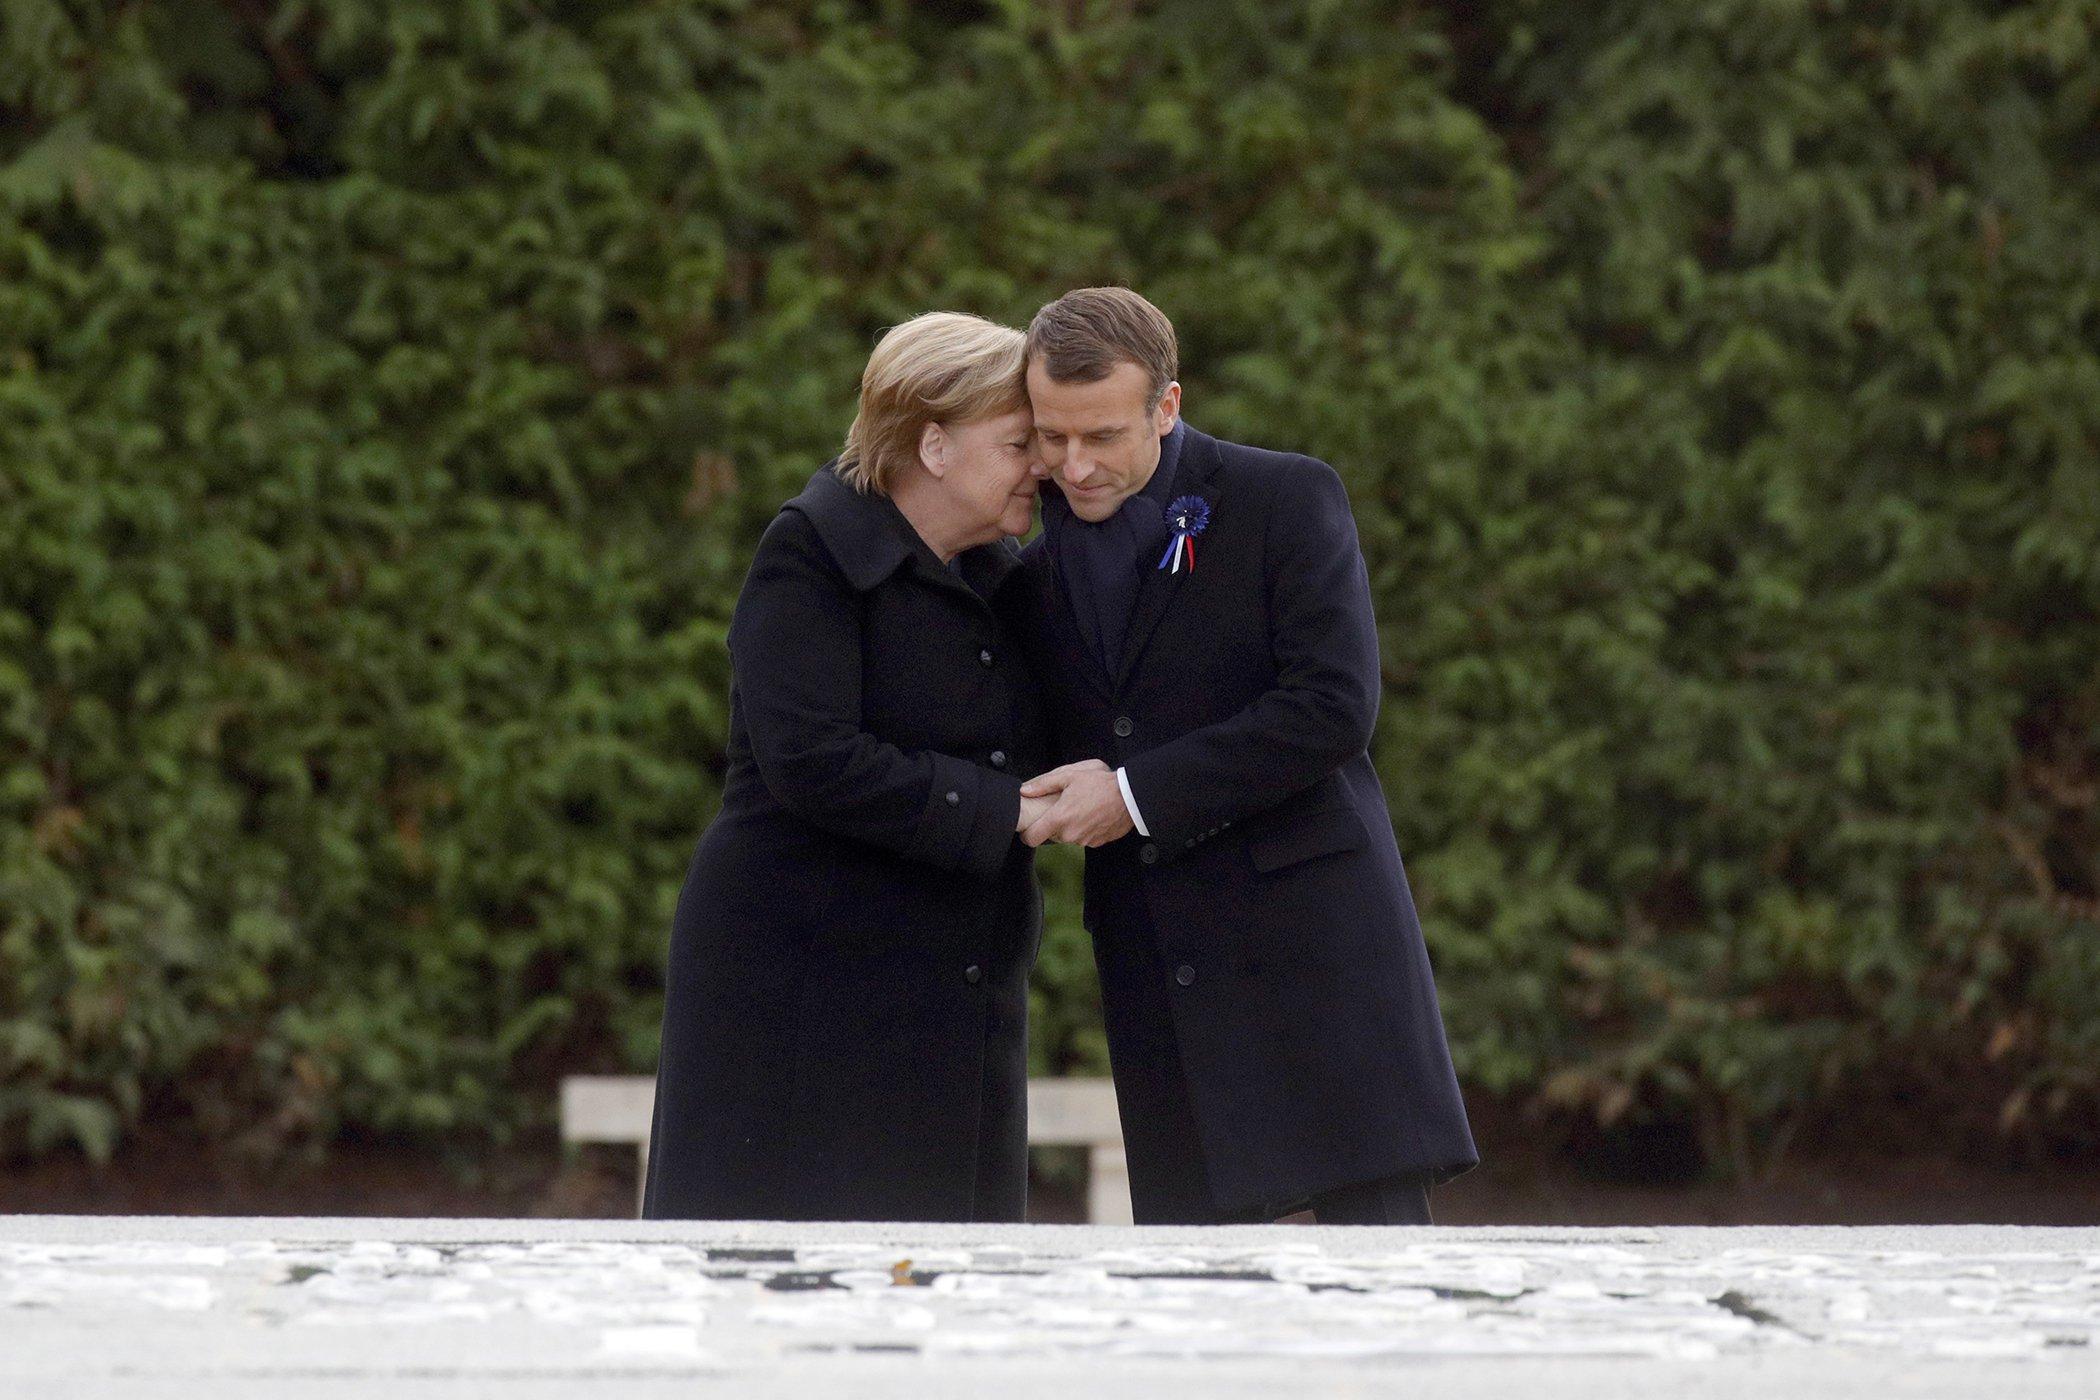 Angela-Merkel-Emmanuel-Macron-WWI.jpg